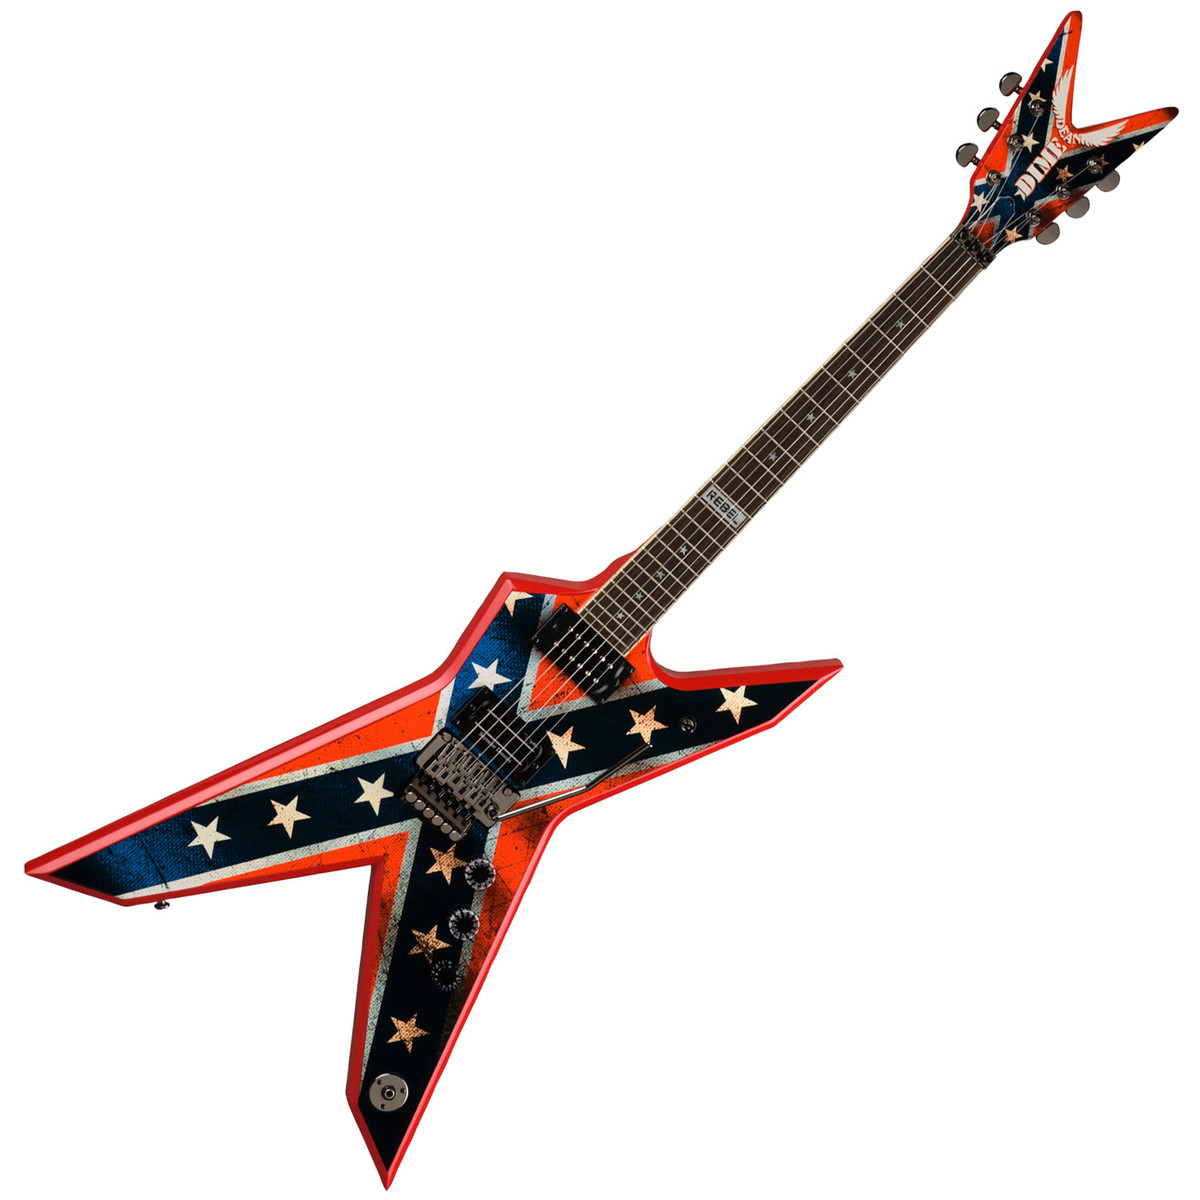 dean dimebag dixie rebel electric guitar flag graphic at